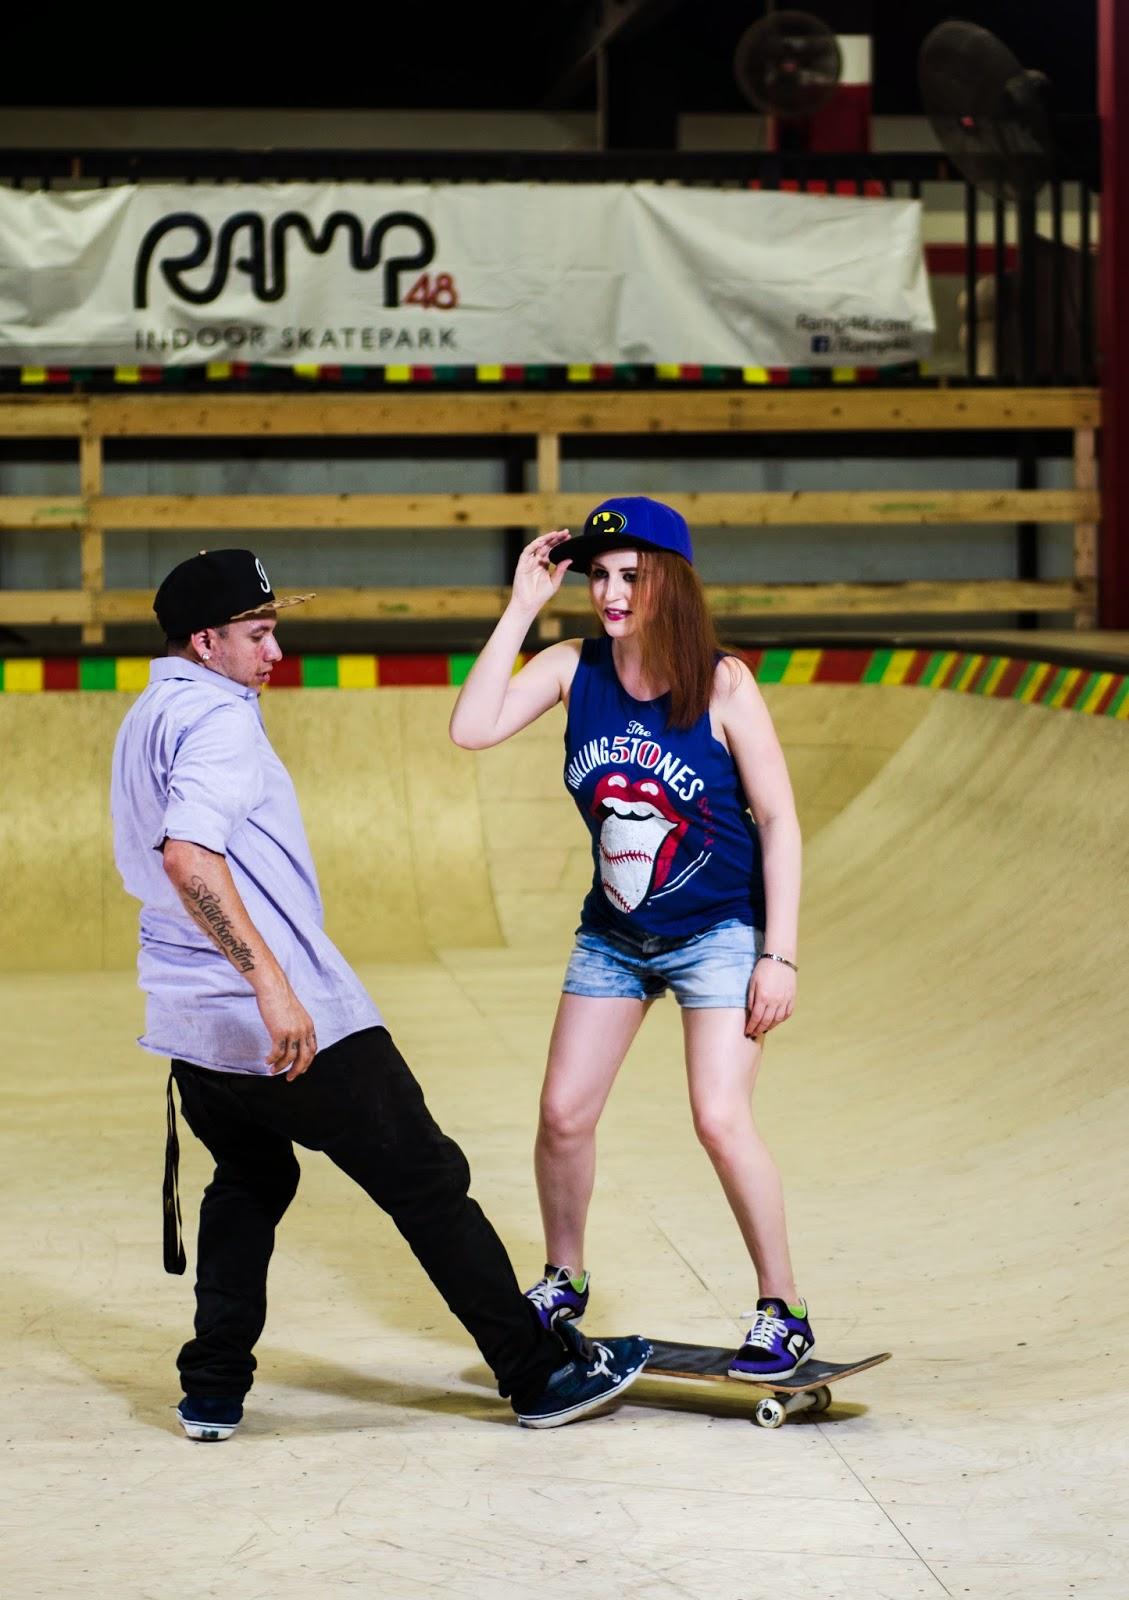 Twin Vogue Grunge Fashion Series Skater Girl